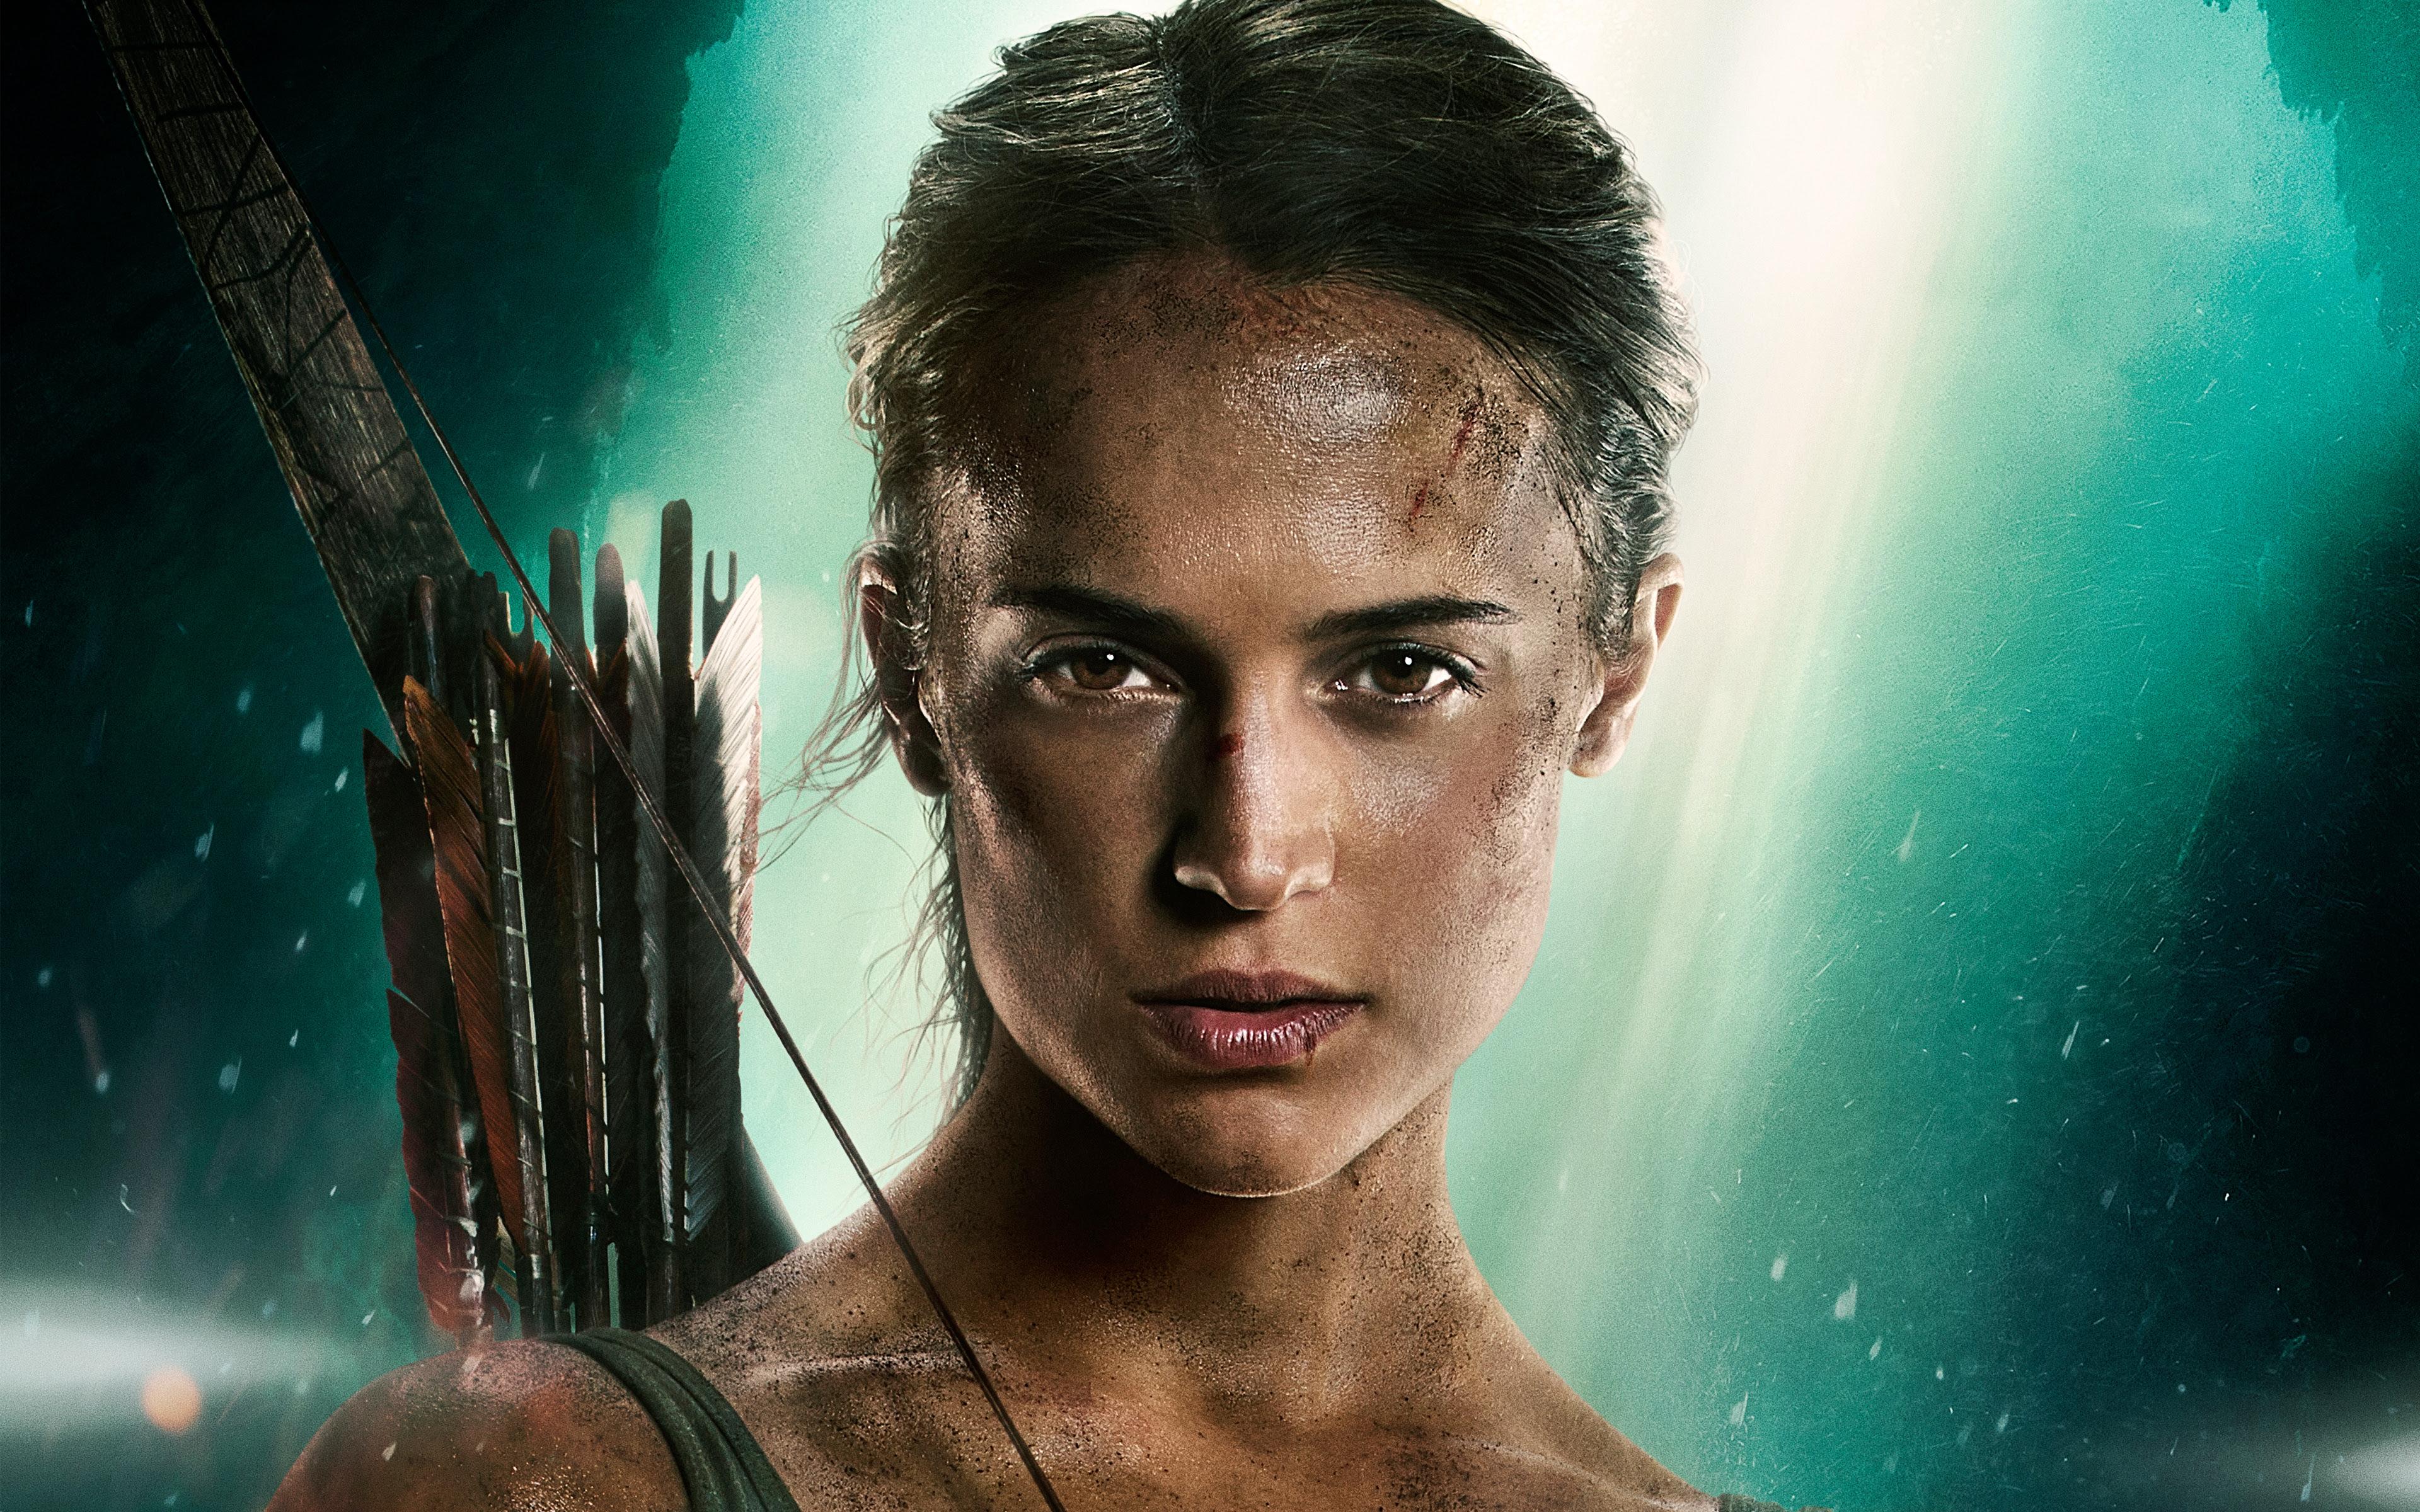 Lara Croft Tomb Raider Alicia Vikander 5k Wallpapers Hd Wallpapers